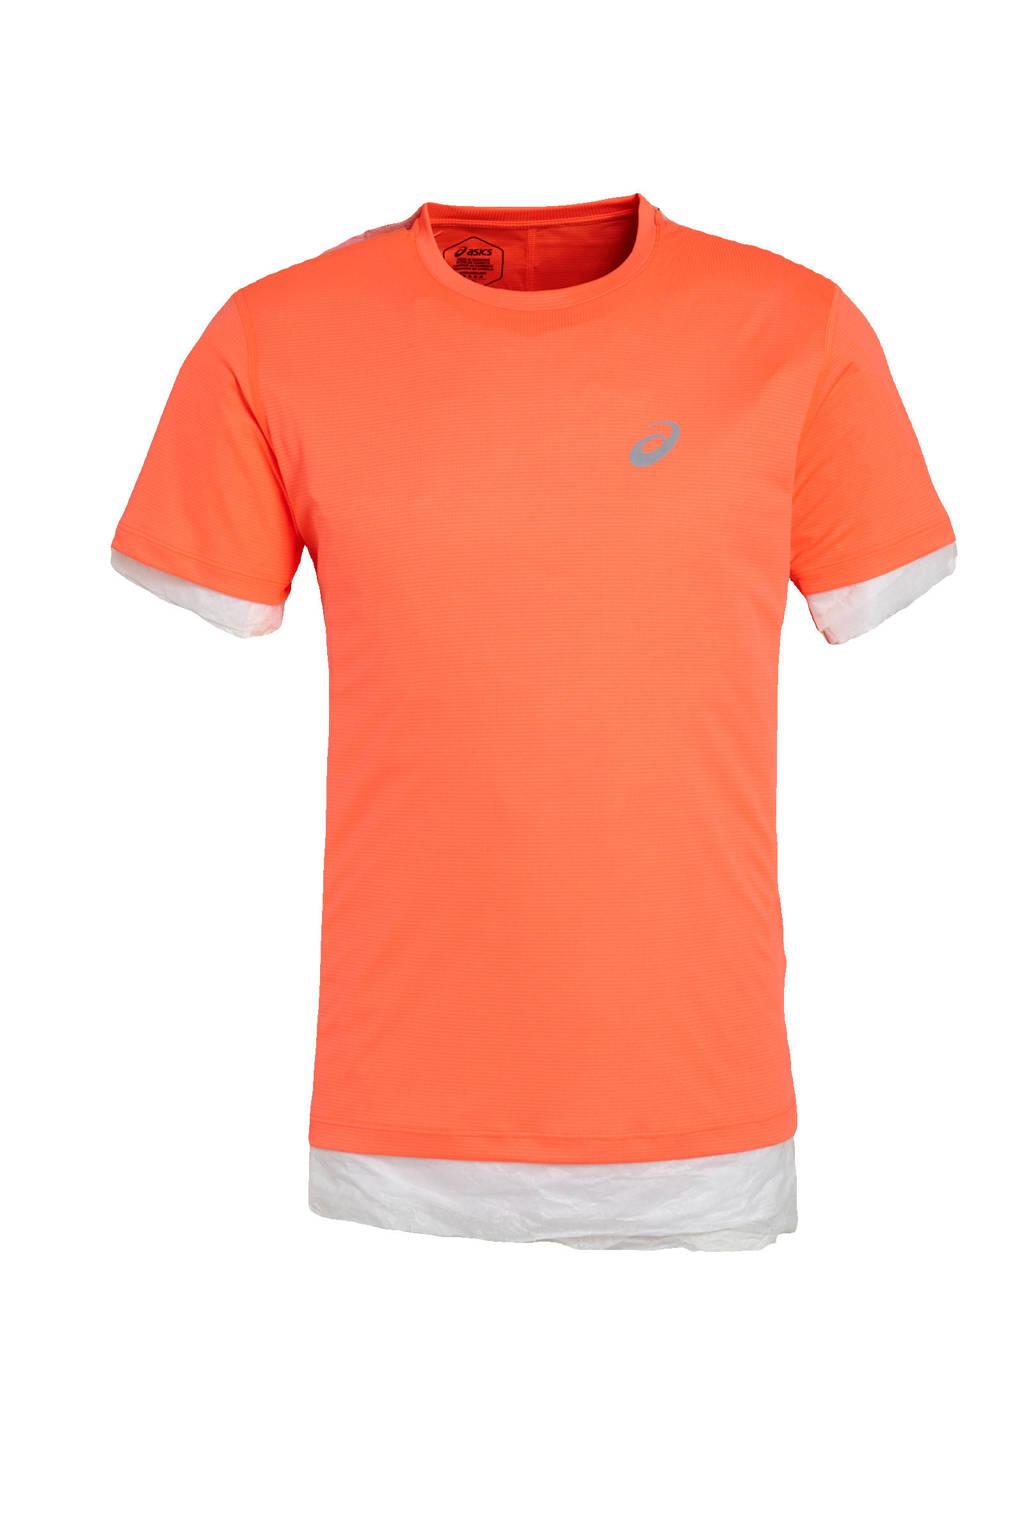 ASICS   hardloop T-shirt oranje, Oranje